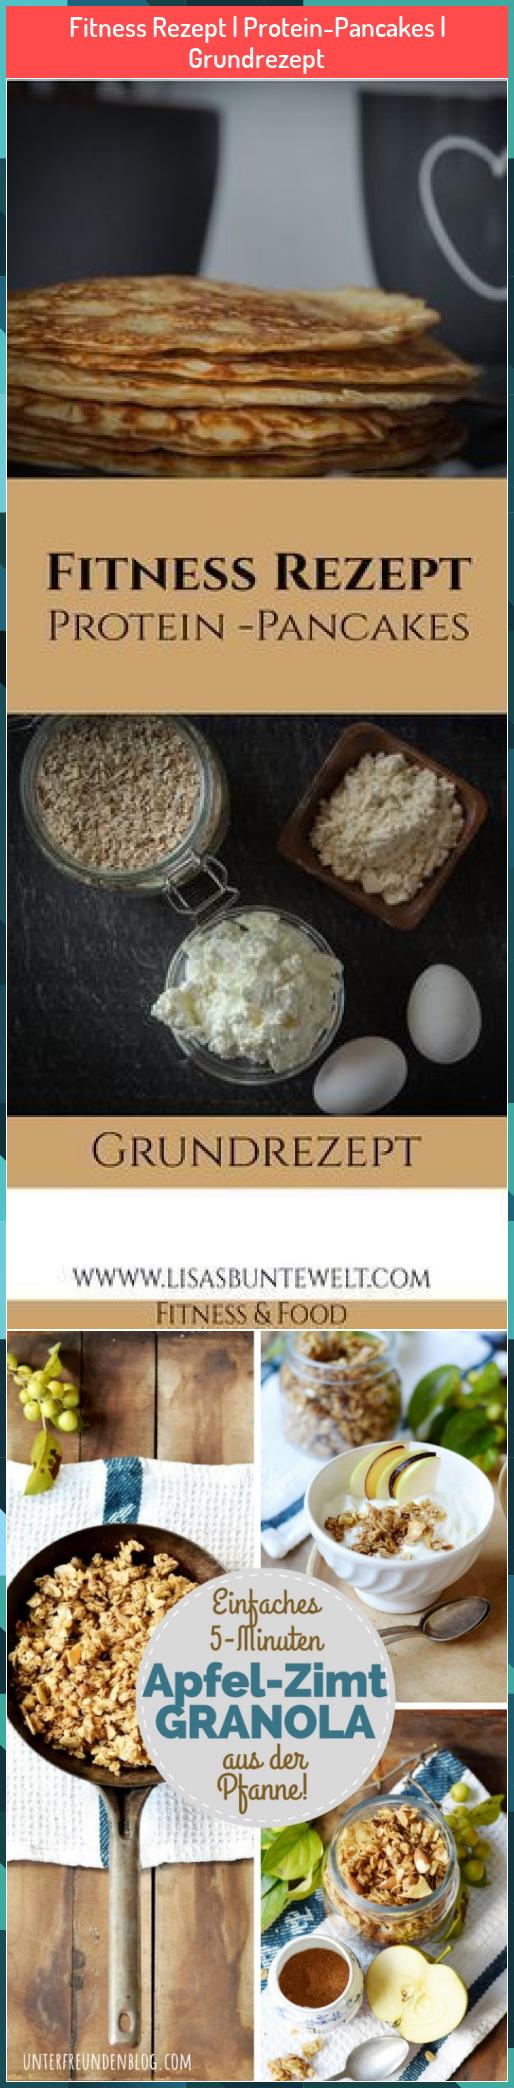 Fitness Rezept | Protein-Pancakes | Grundrezept #Fitness #Rezept #Protein-Pancakes #Grundrezept